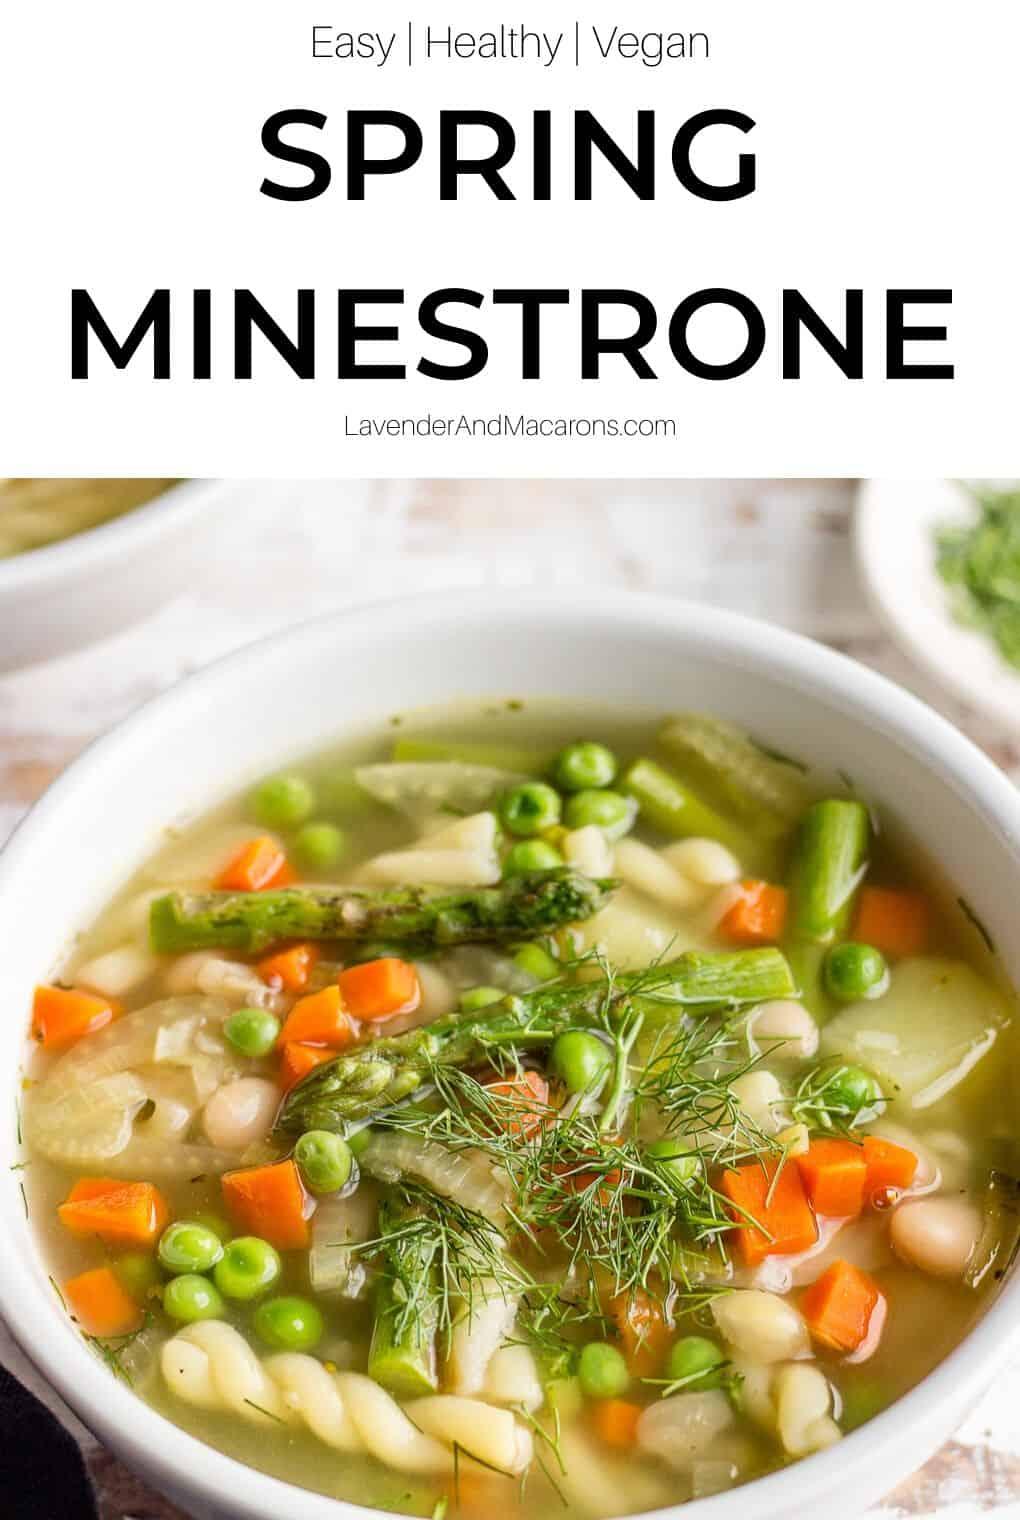 Green Minestrone Pinterest image